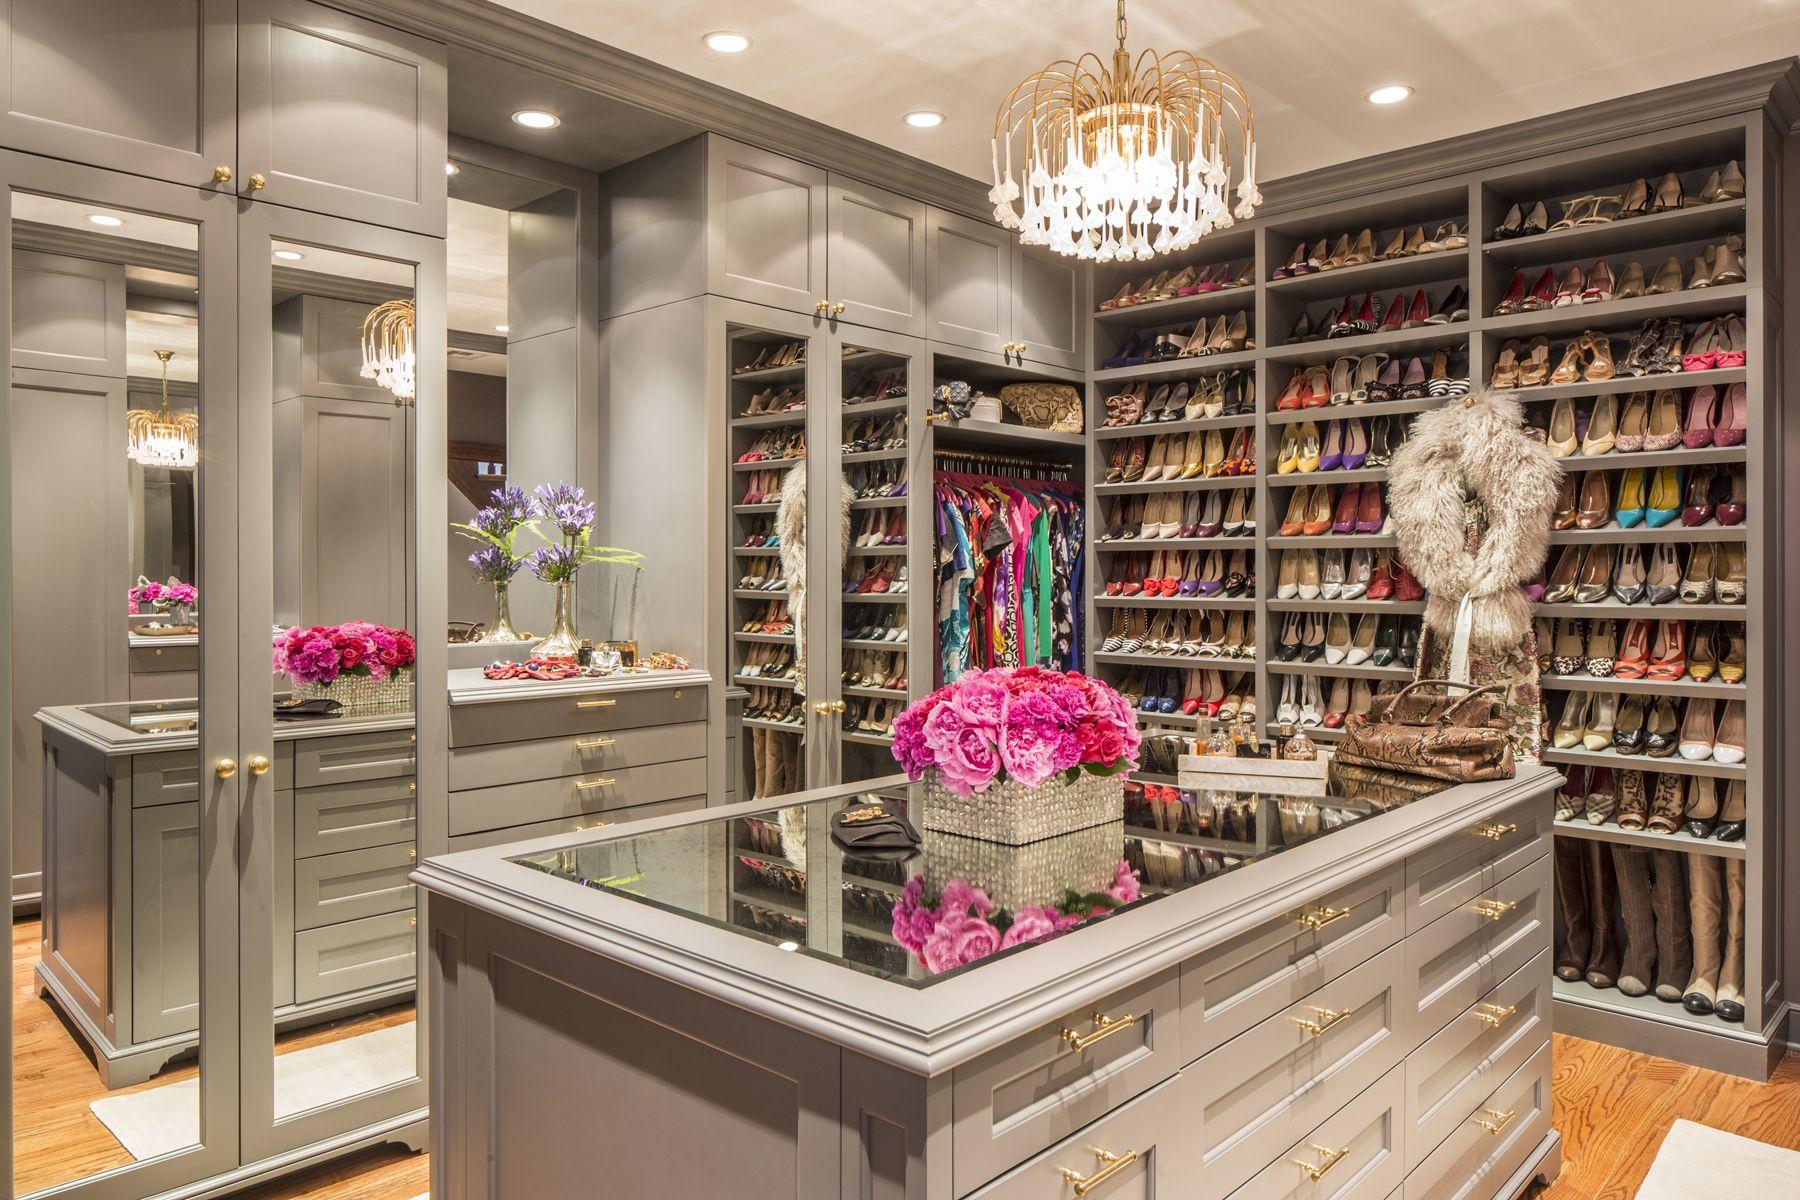 20 Great Walk In Closet Ideas Stunning Large Custom Closet Designs